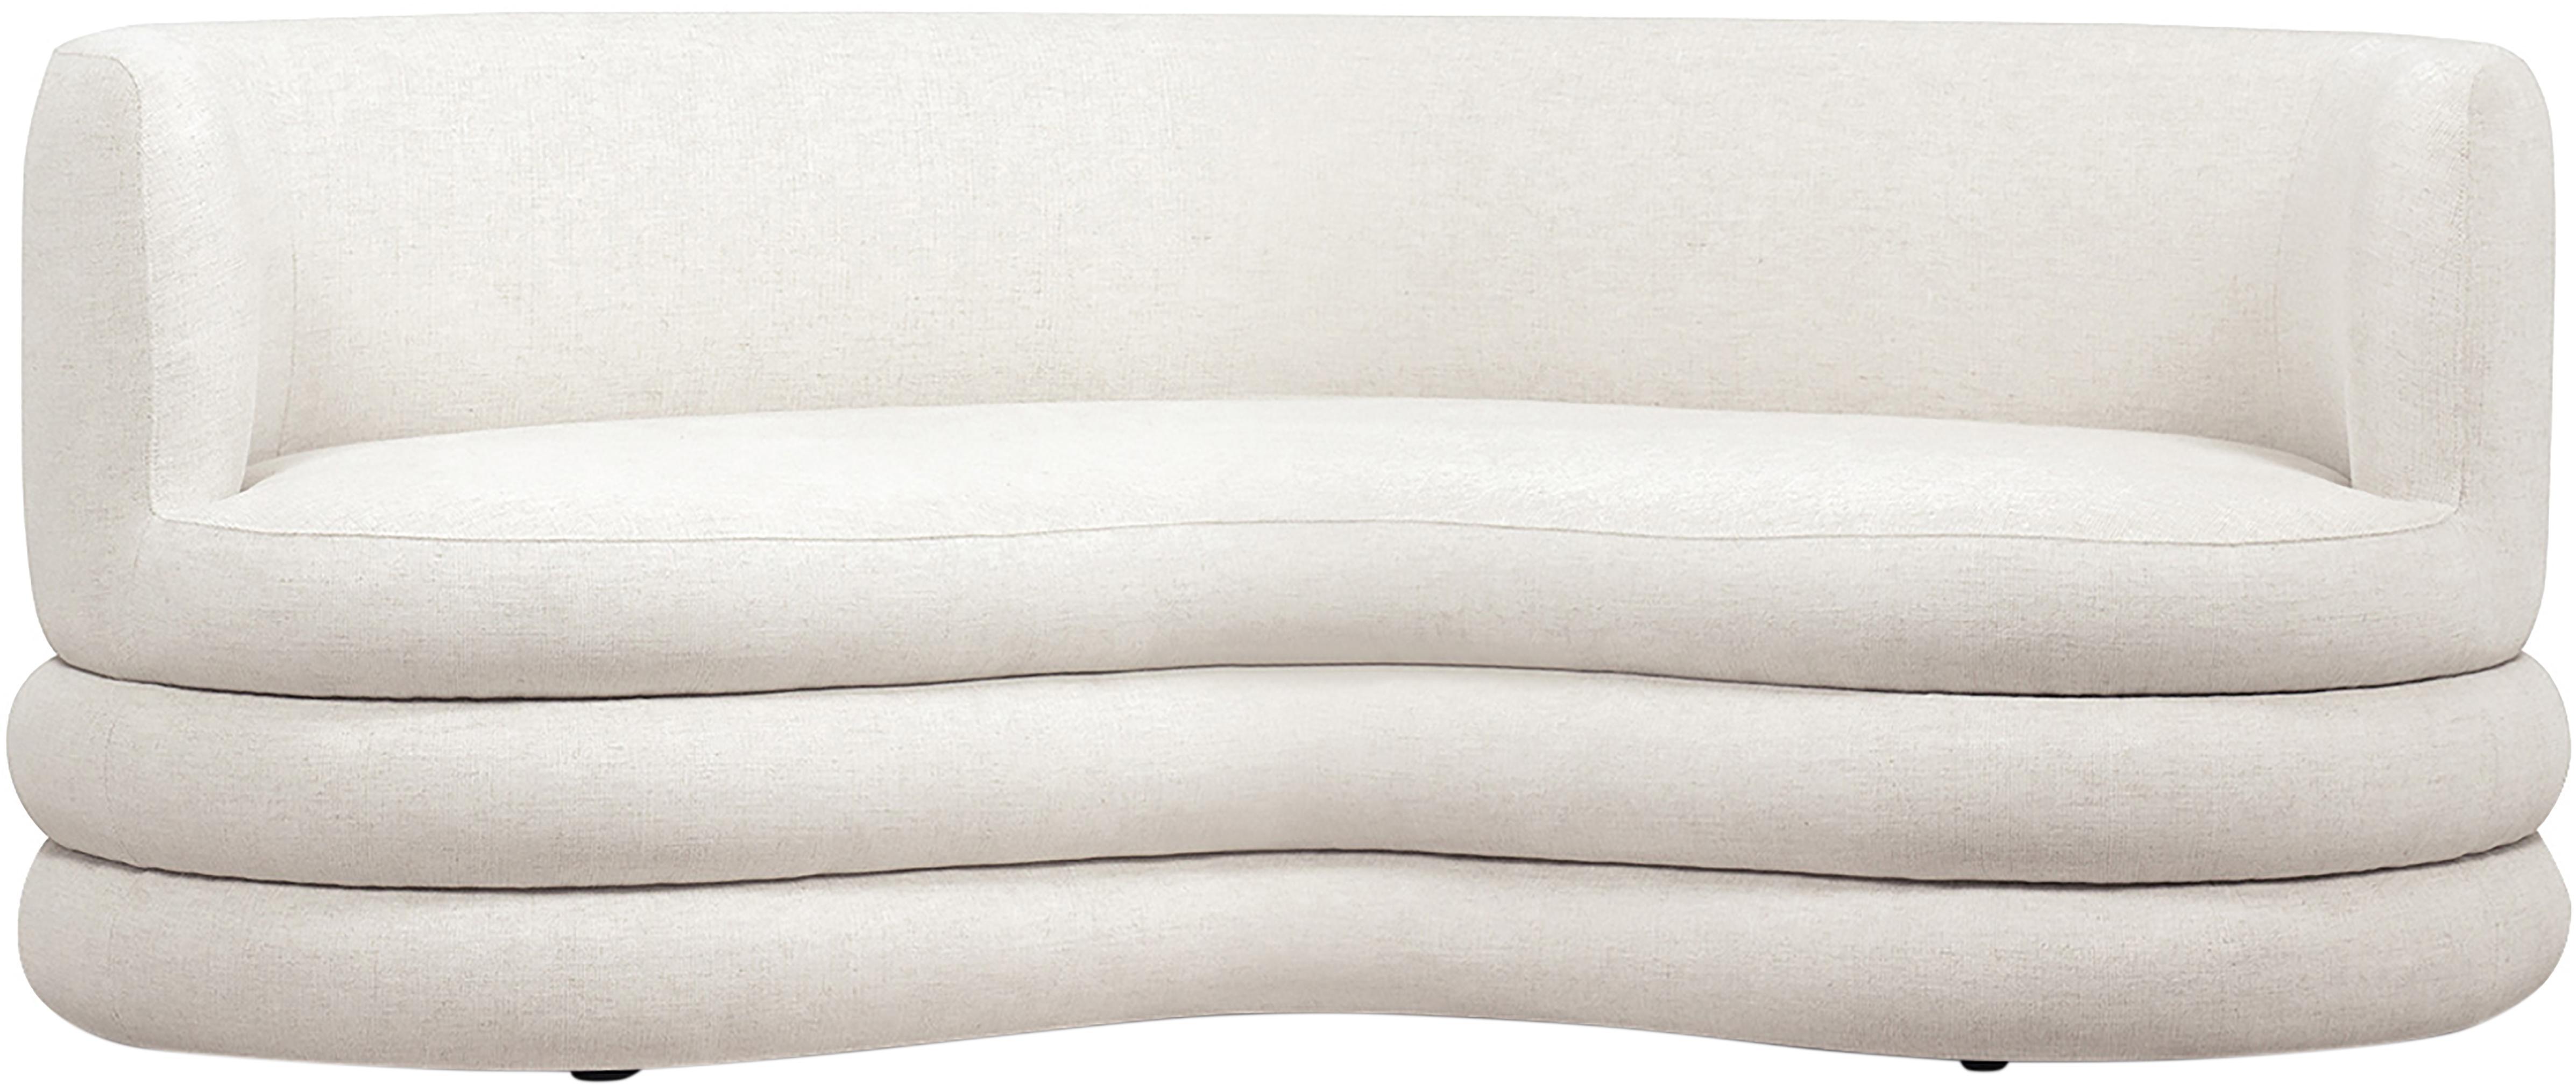 Bank Solomon (3-zits), Bekleding: 56% viscose, 21% polyeste, Frame: massief sparrenhout, berk, Poten: kunststof, Bekleding: beige. Poten: zwart, B 200 x D 95 cm